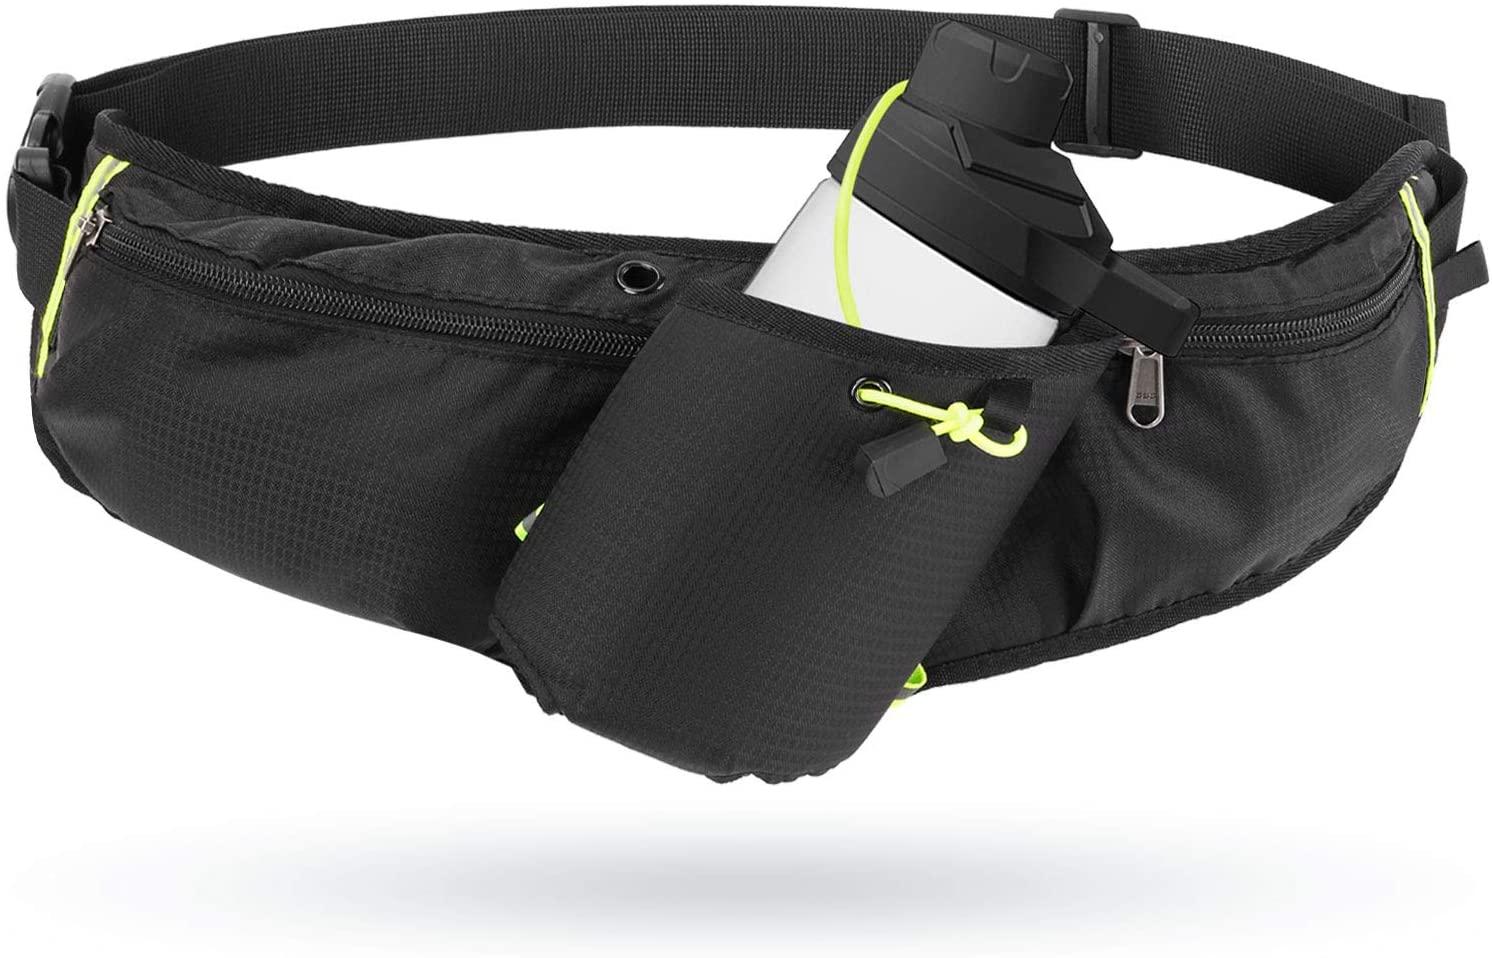 Odoland Running Belt Hydration Waist Pack with Water Bottle Holder for Men Women, Waist Pouch Fanny Pack Bag, Reflective Fits 6.5'' Cellphone